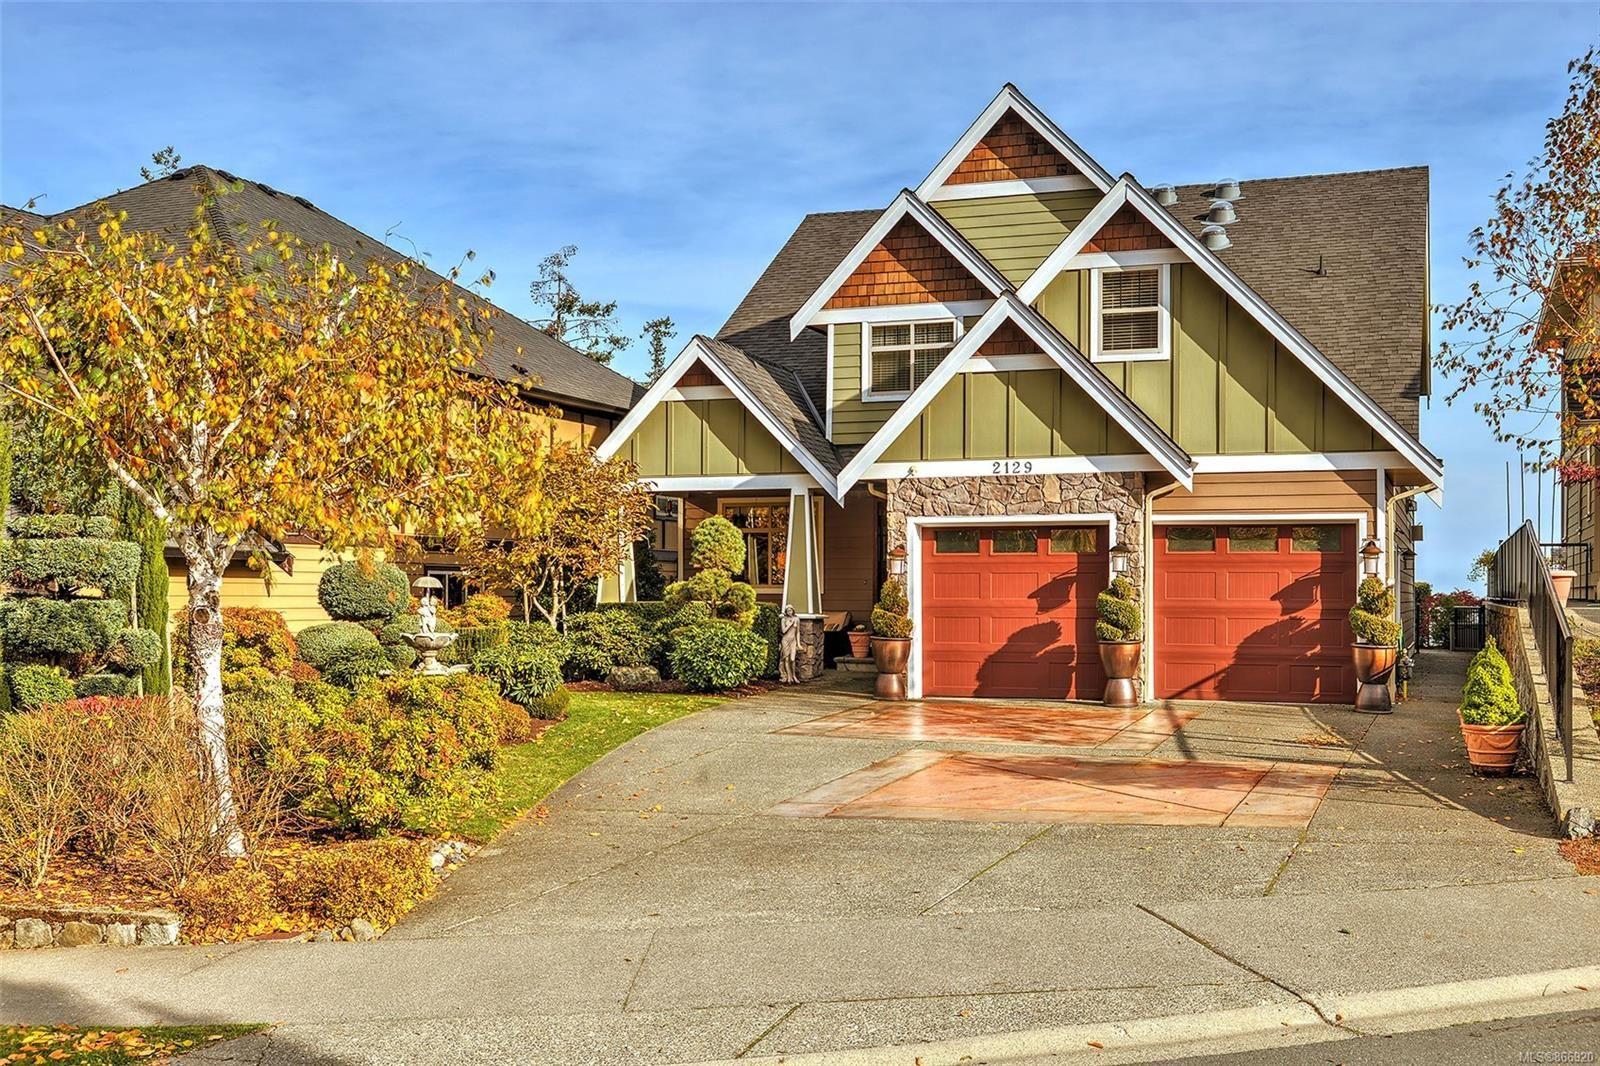 Main Photo: 2129 Quails Run in : La Bear Mountain House for sale (Langford)  : MLS®# 866920